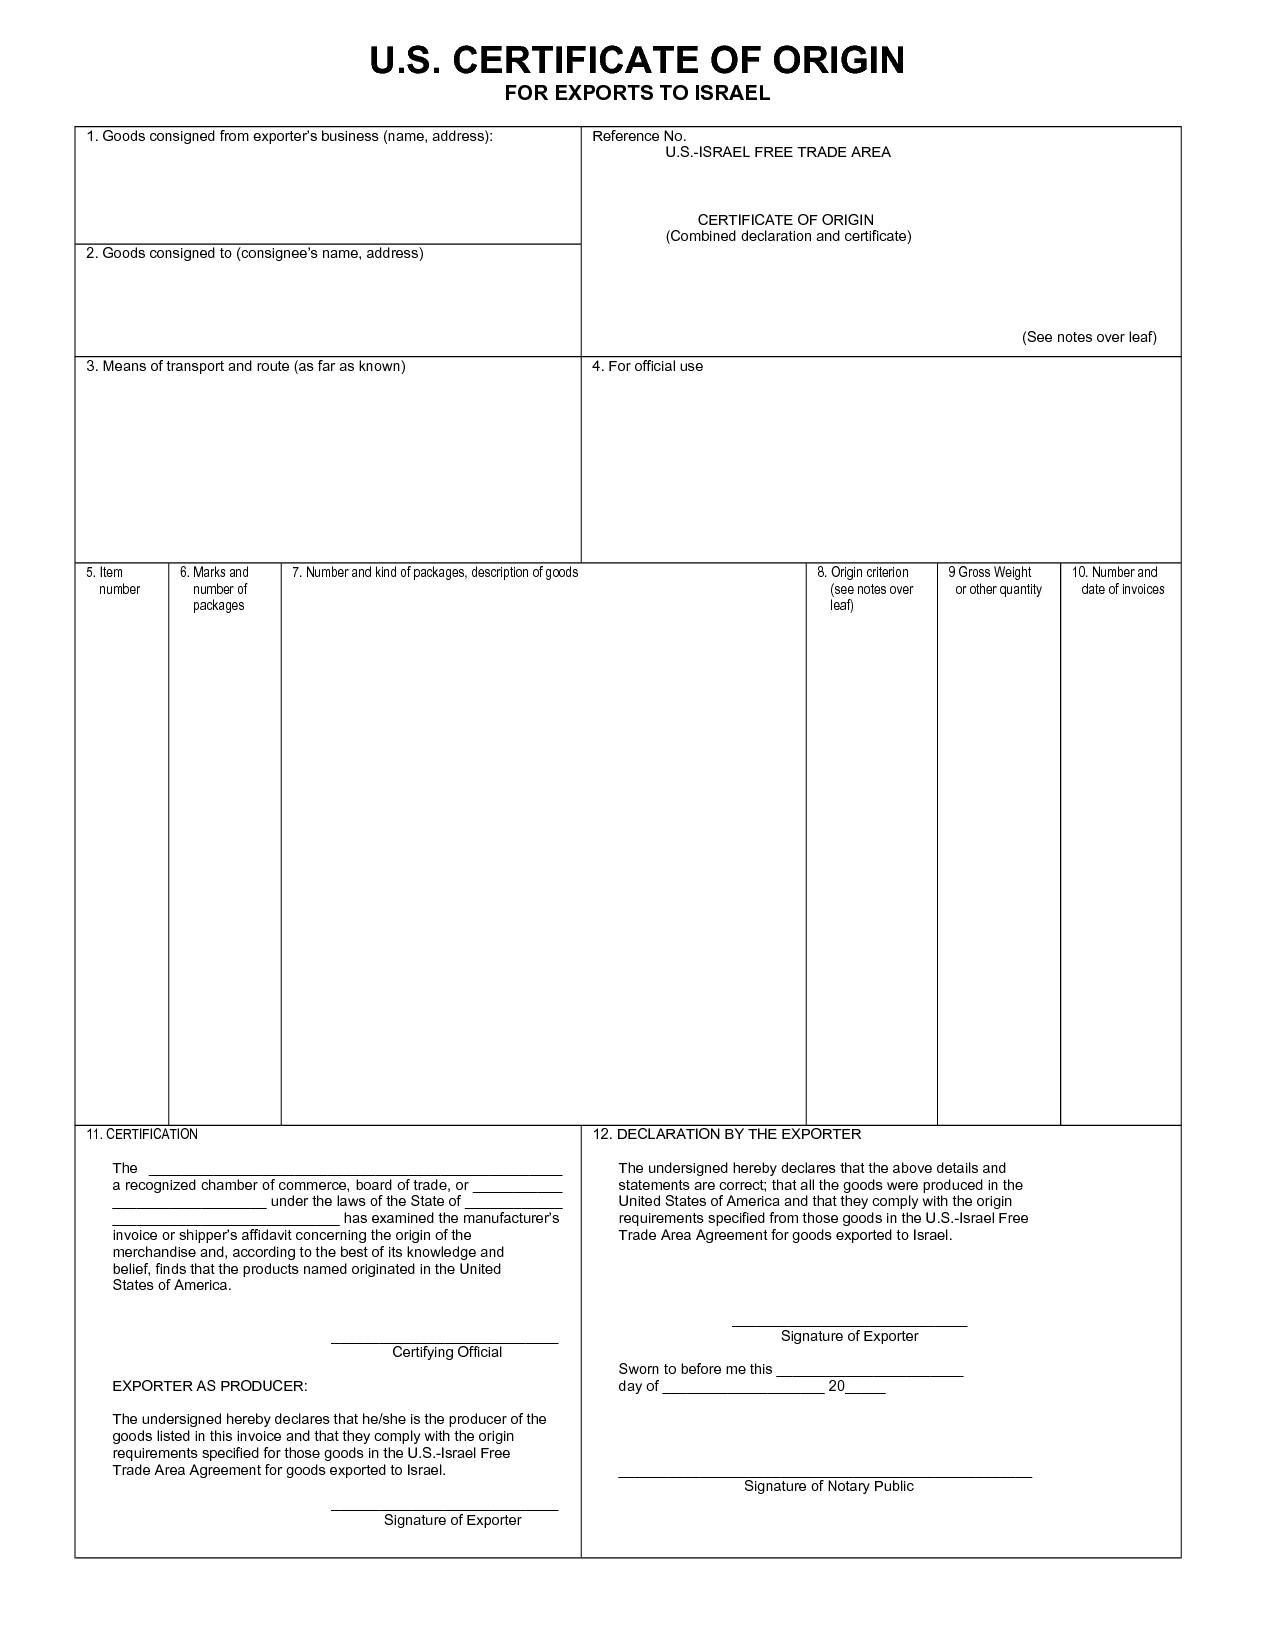 Sample Of Certificate Of Origin Template Excel And Certificate Of Origin Template Excel For Free